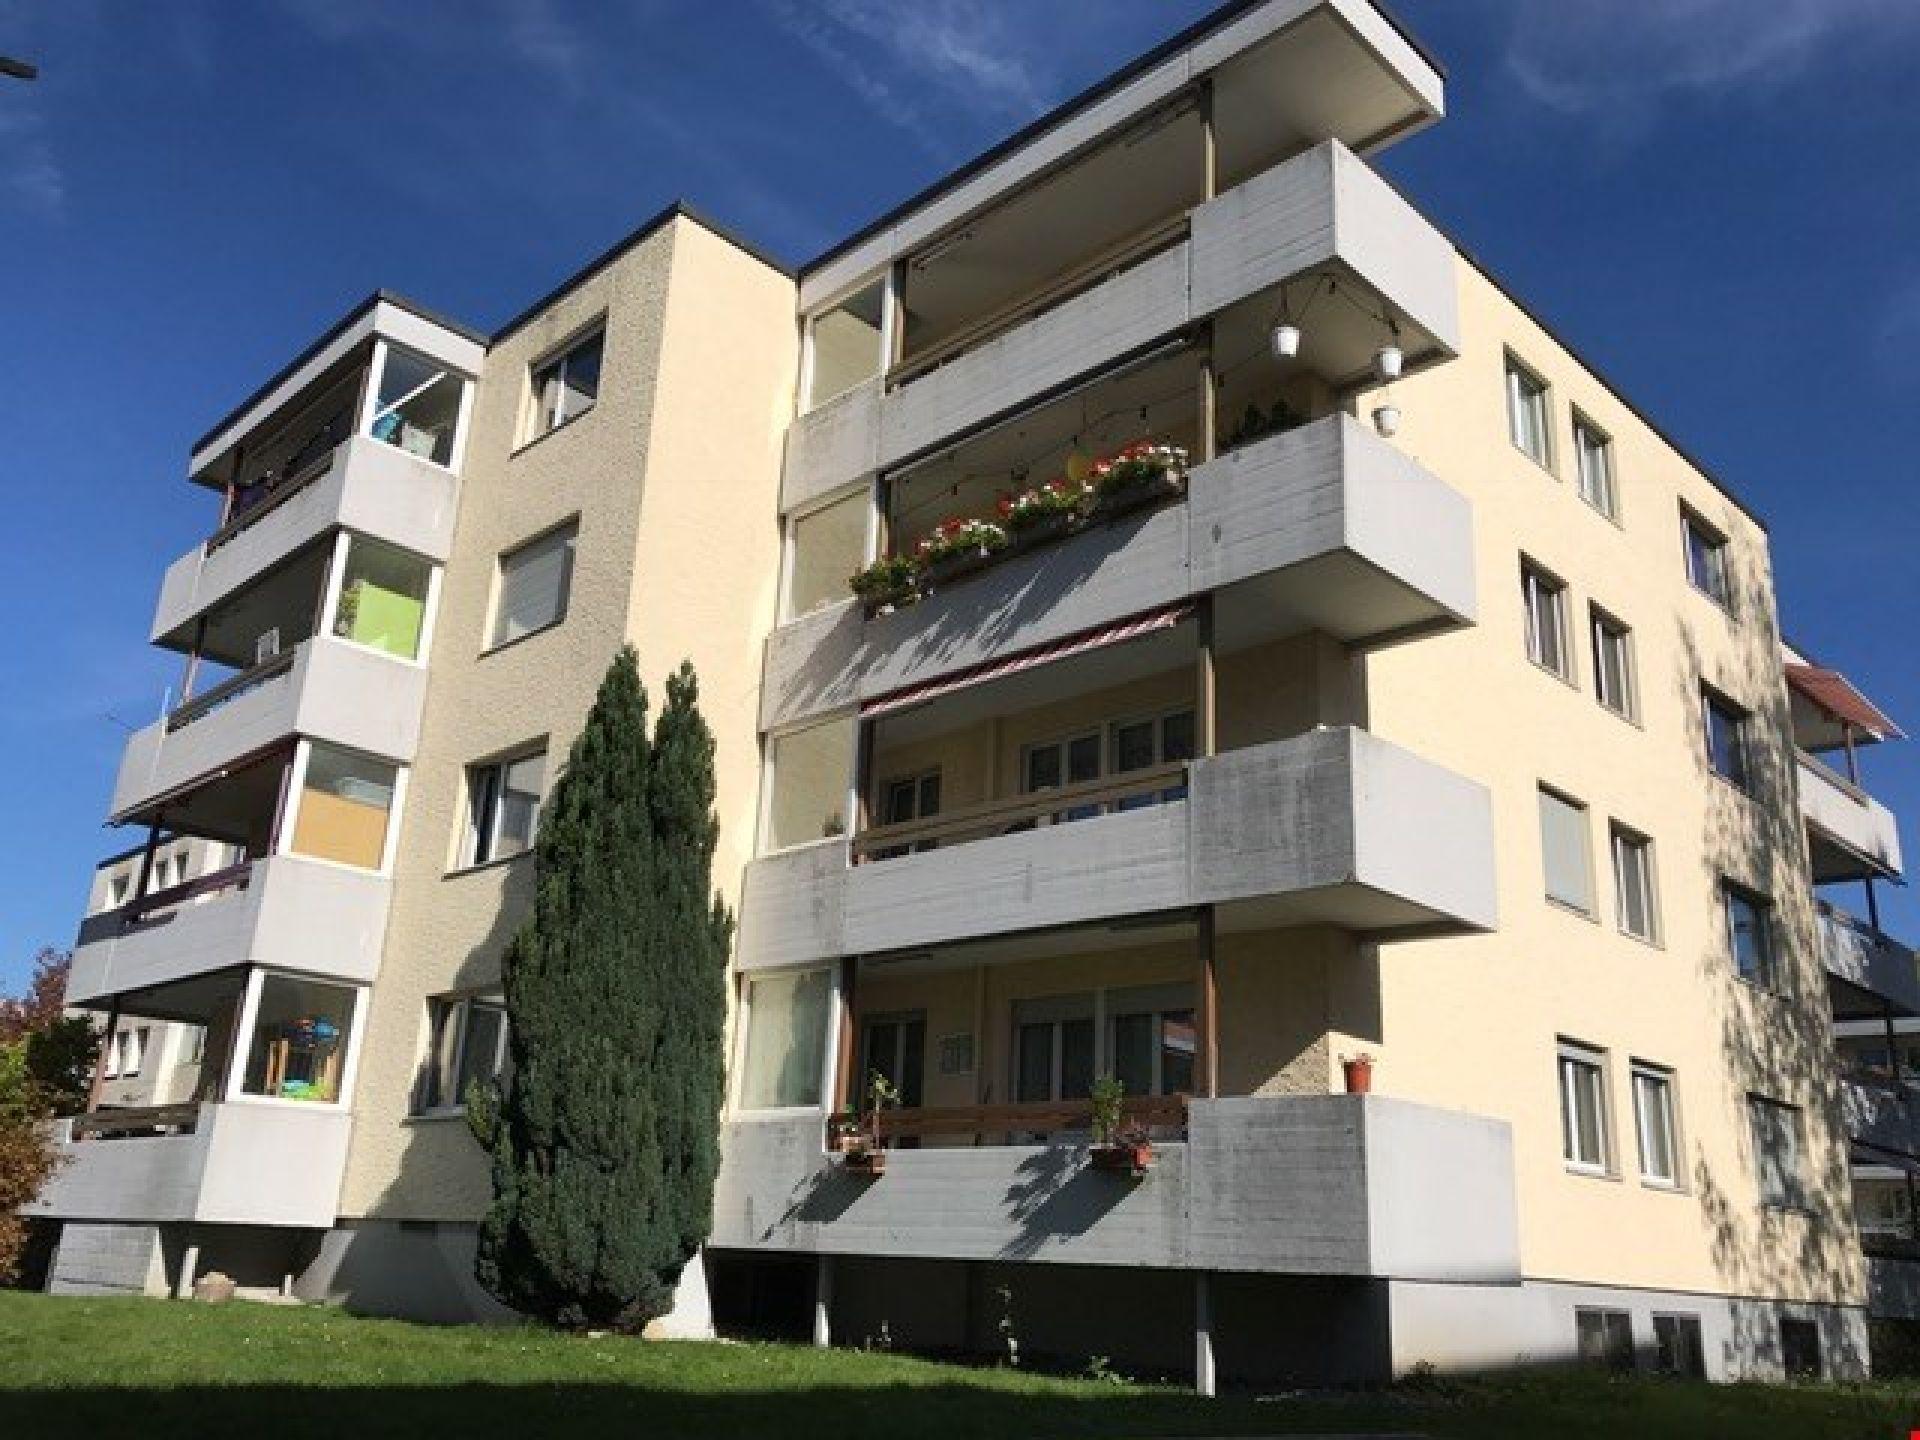 Grosszügige Mietwohnung im Lindenhof-Quartier